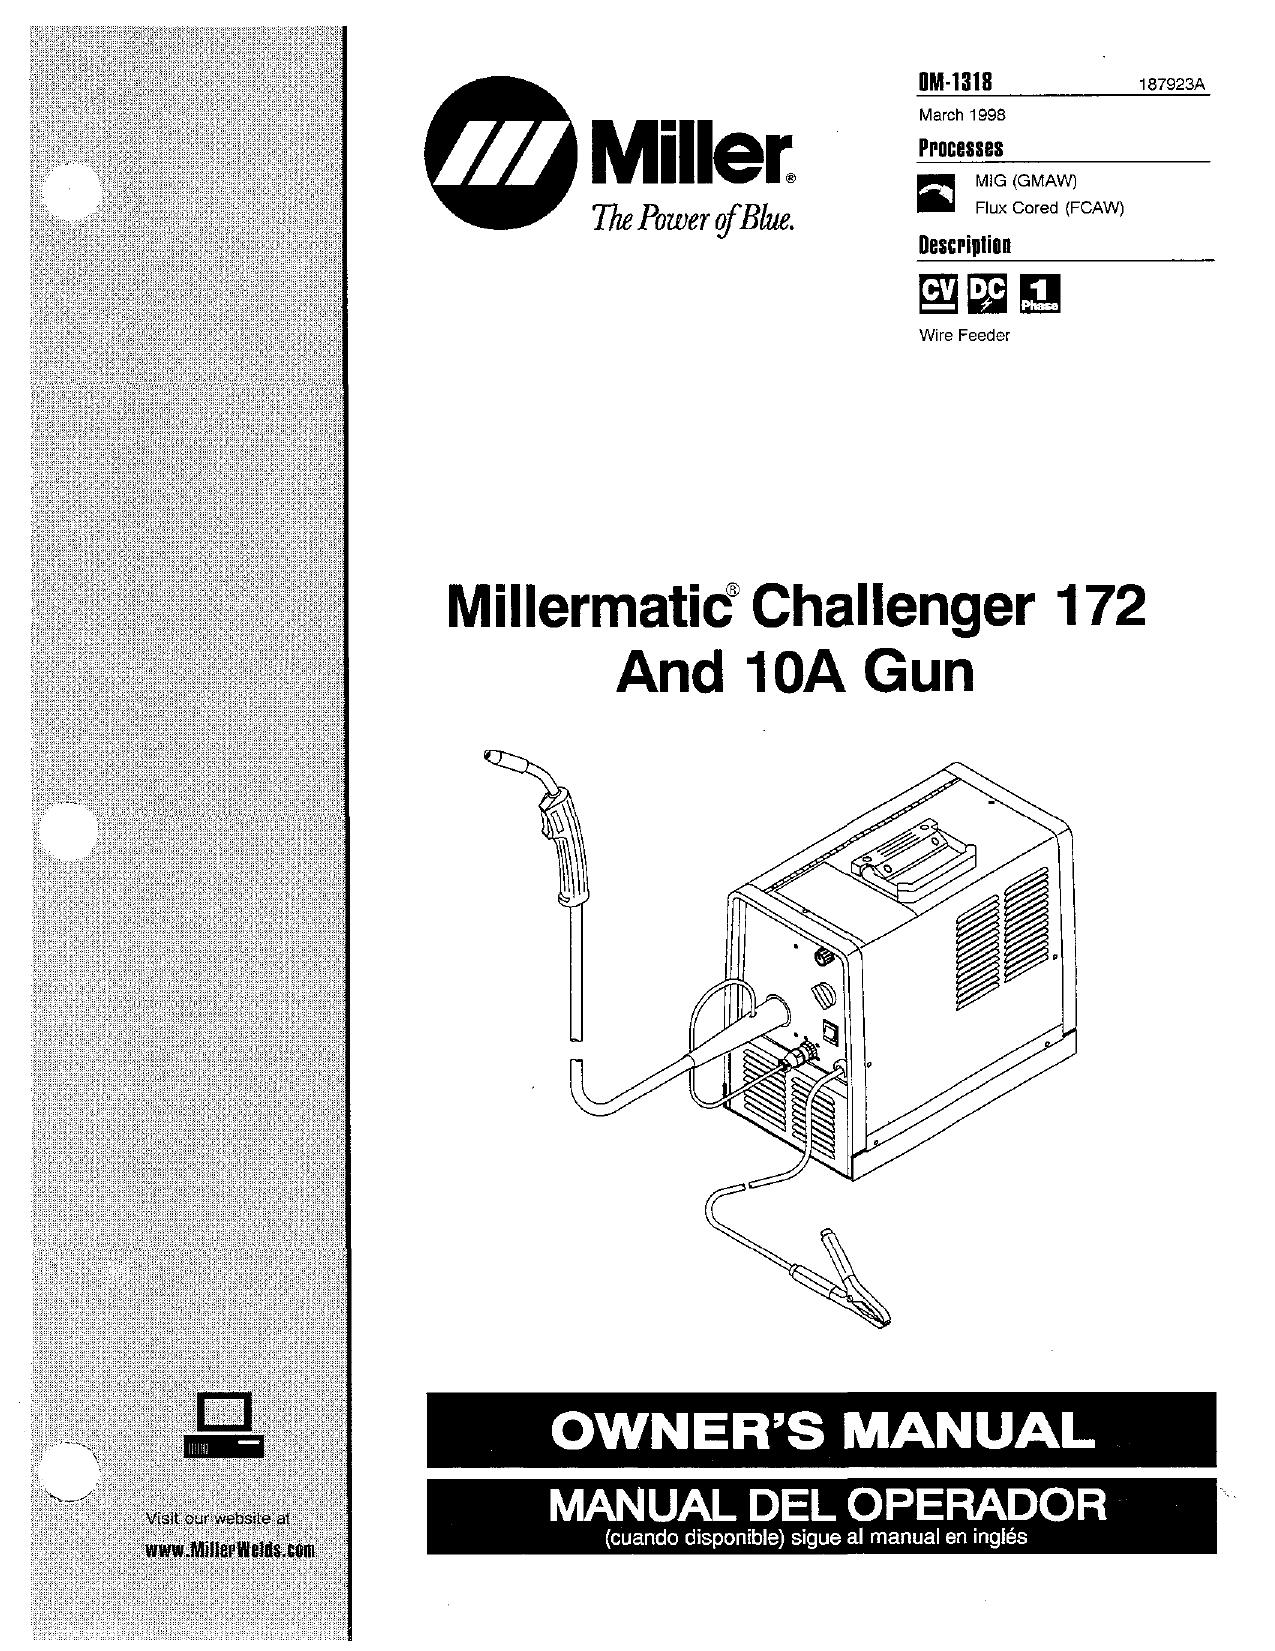 Miller KJ40 Owner's manual   Manualzz